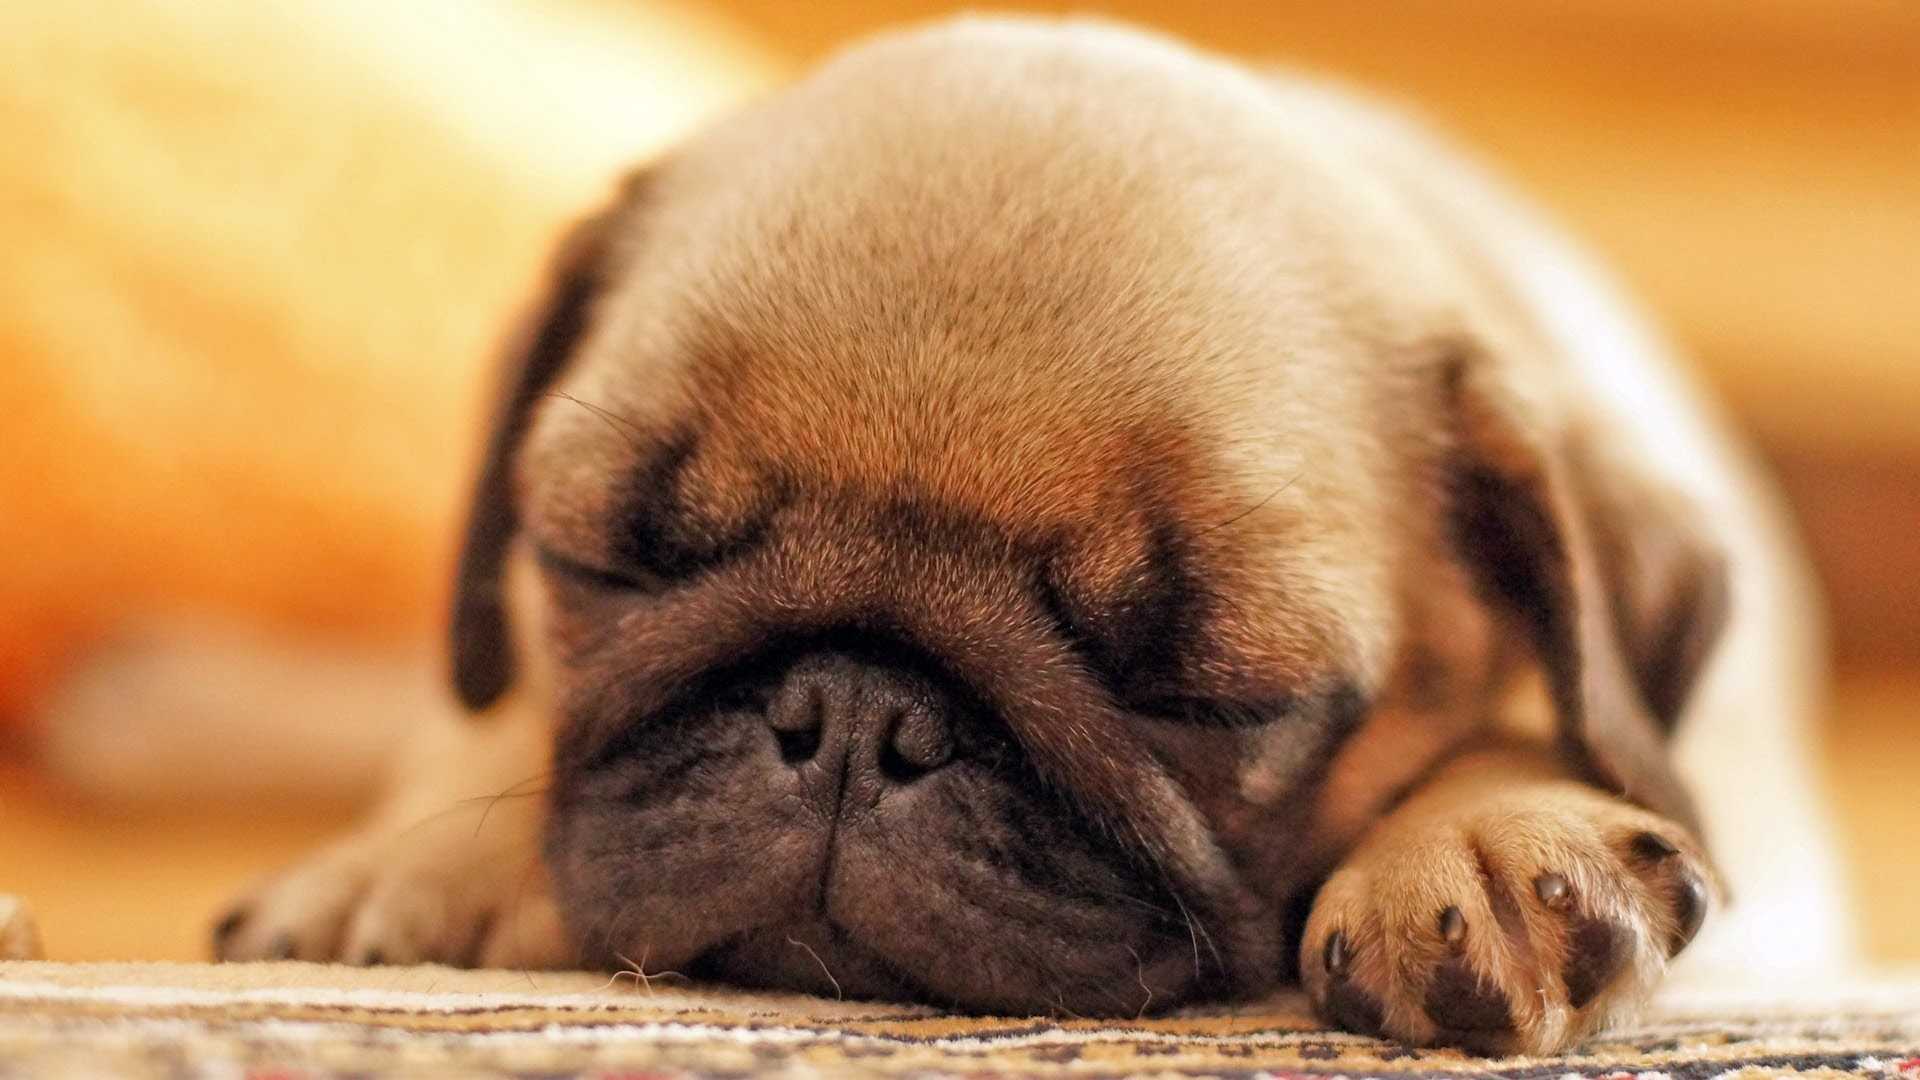 Black Pug Puppy Hd Wallpaper Cute Pug Puppies Sleeping 92329 Hd Wallpaper Backgrounds Download